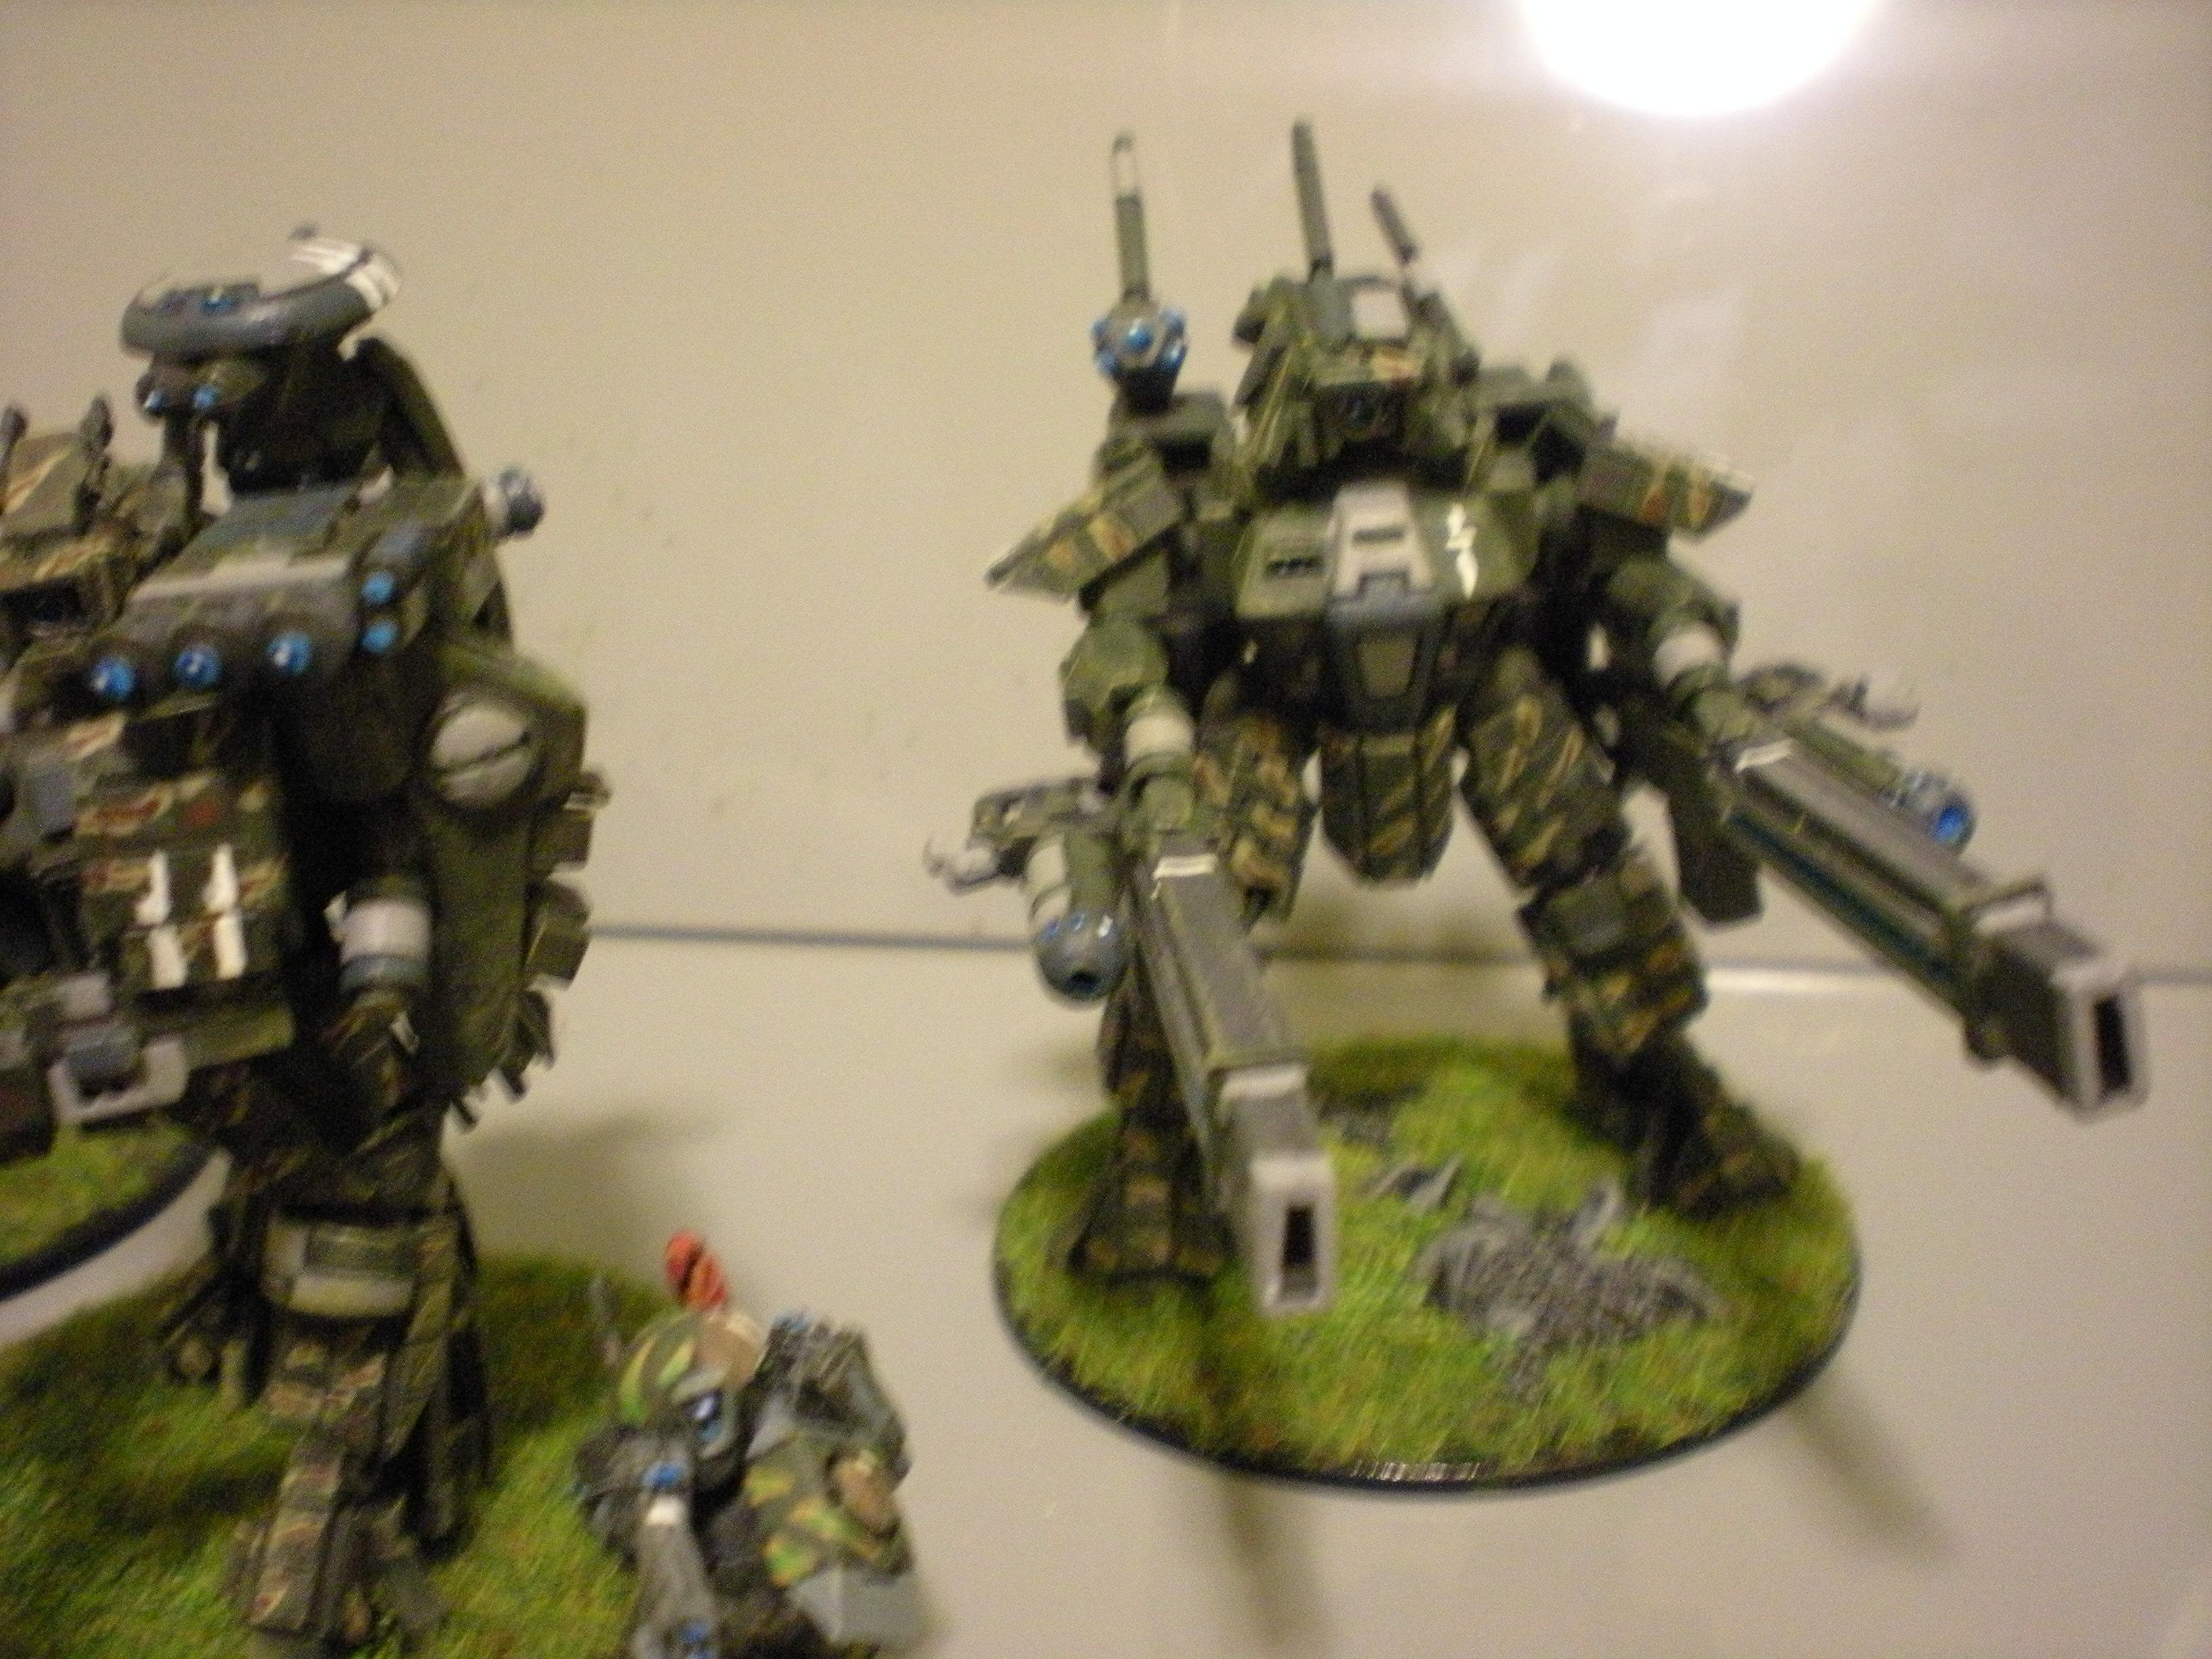 Battlesuit, Blurred Photo, Broadsides, Conversion, Tau, Tau Conversions, Warhammer 40,000